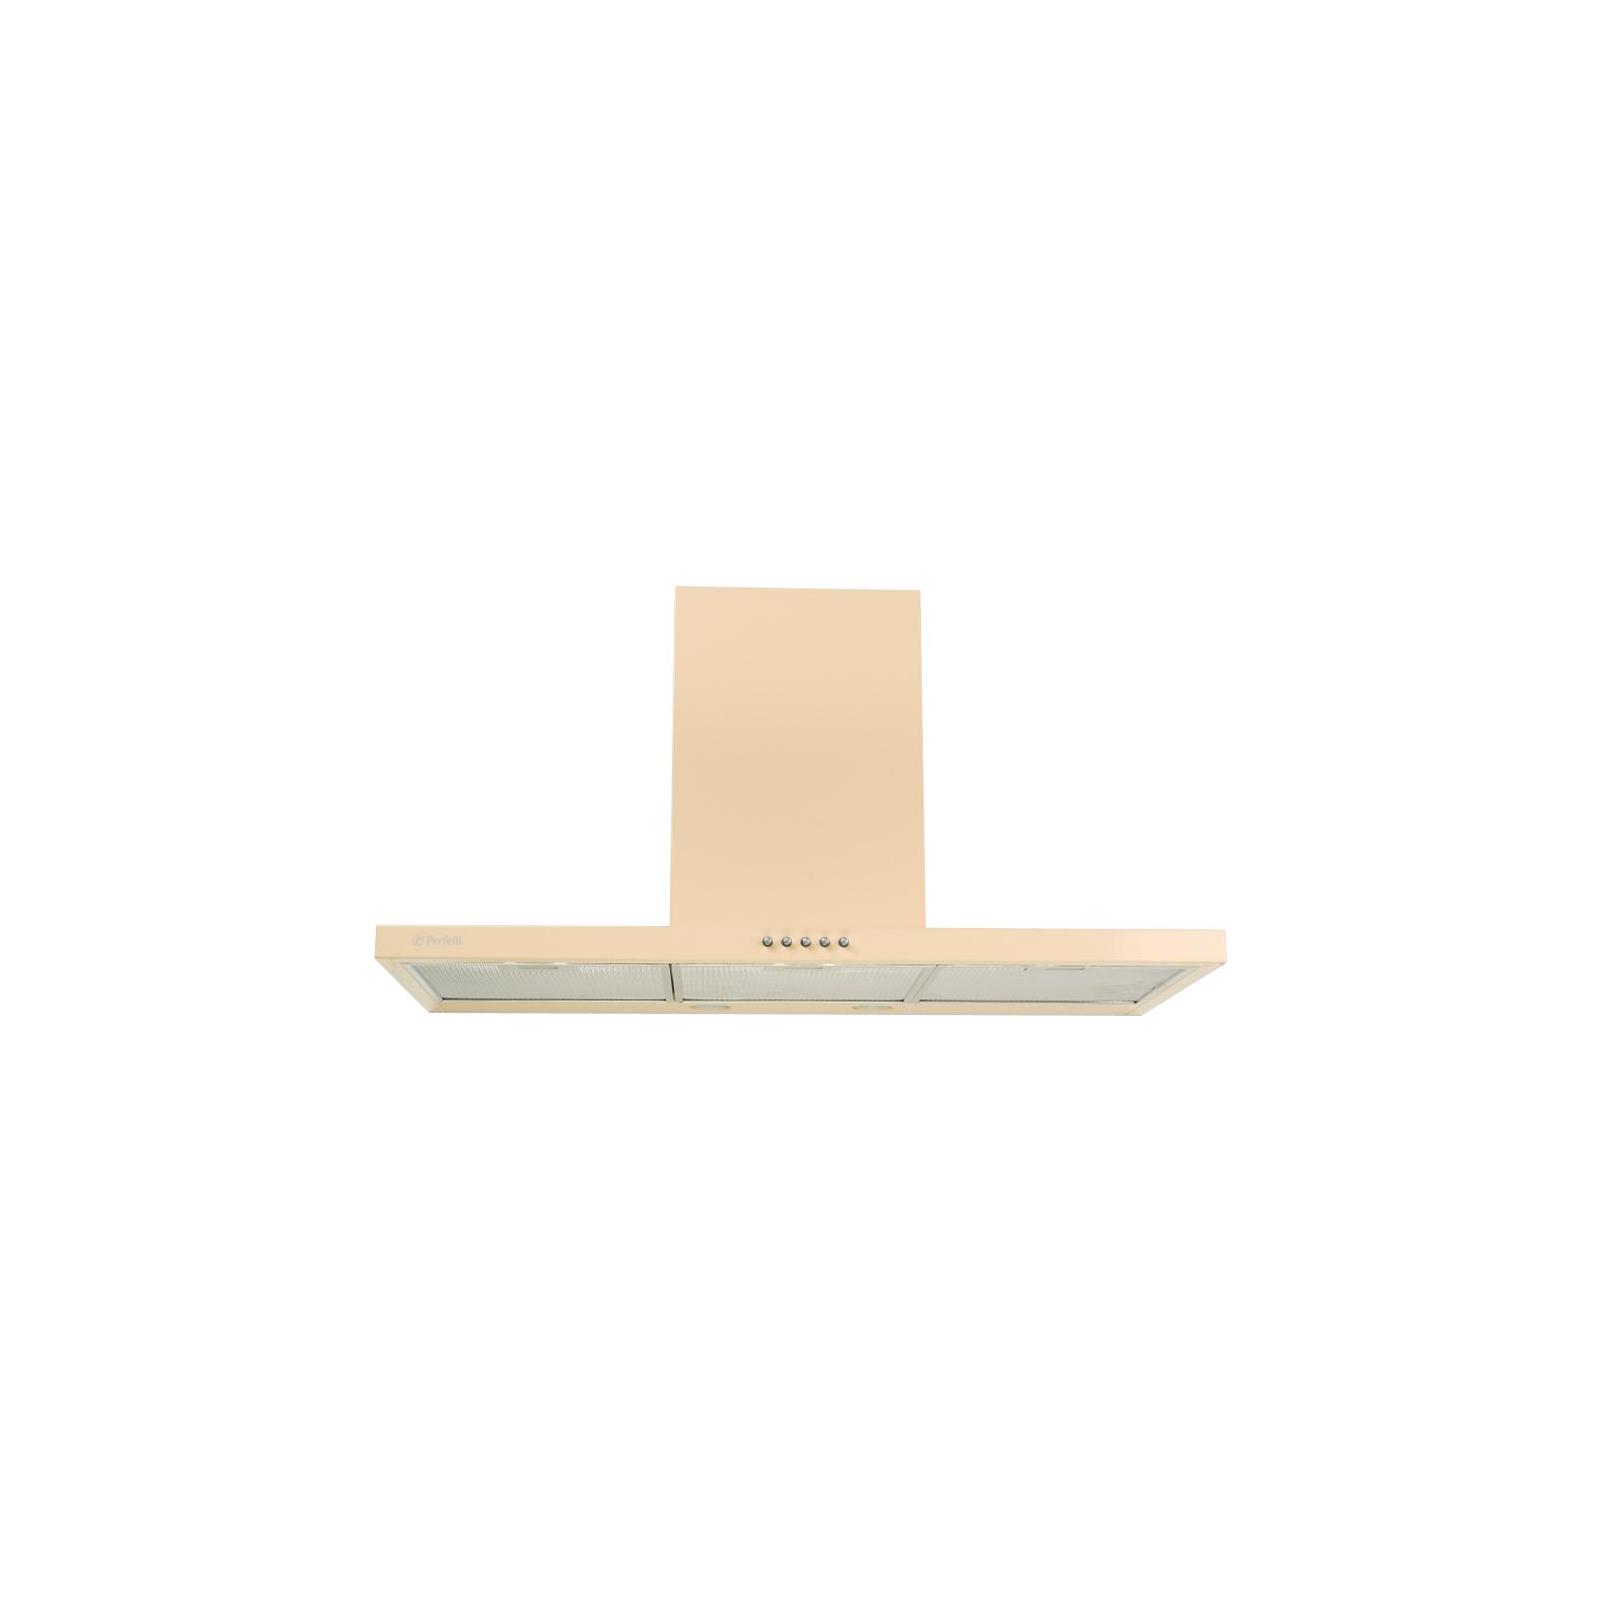 Вытяжка кухонная PERFELLI T 9612 A 1000 IV LED